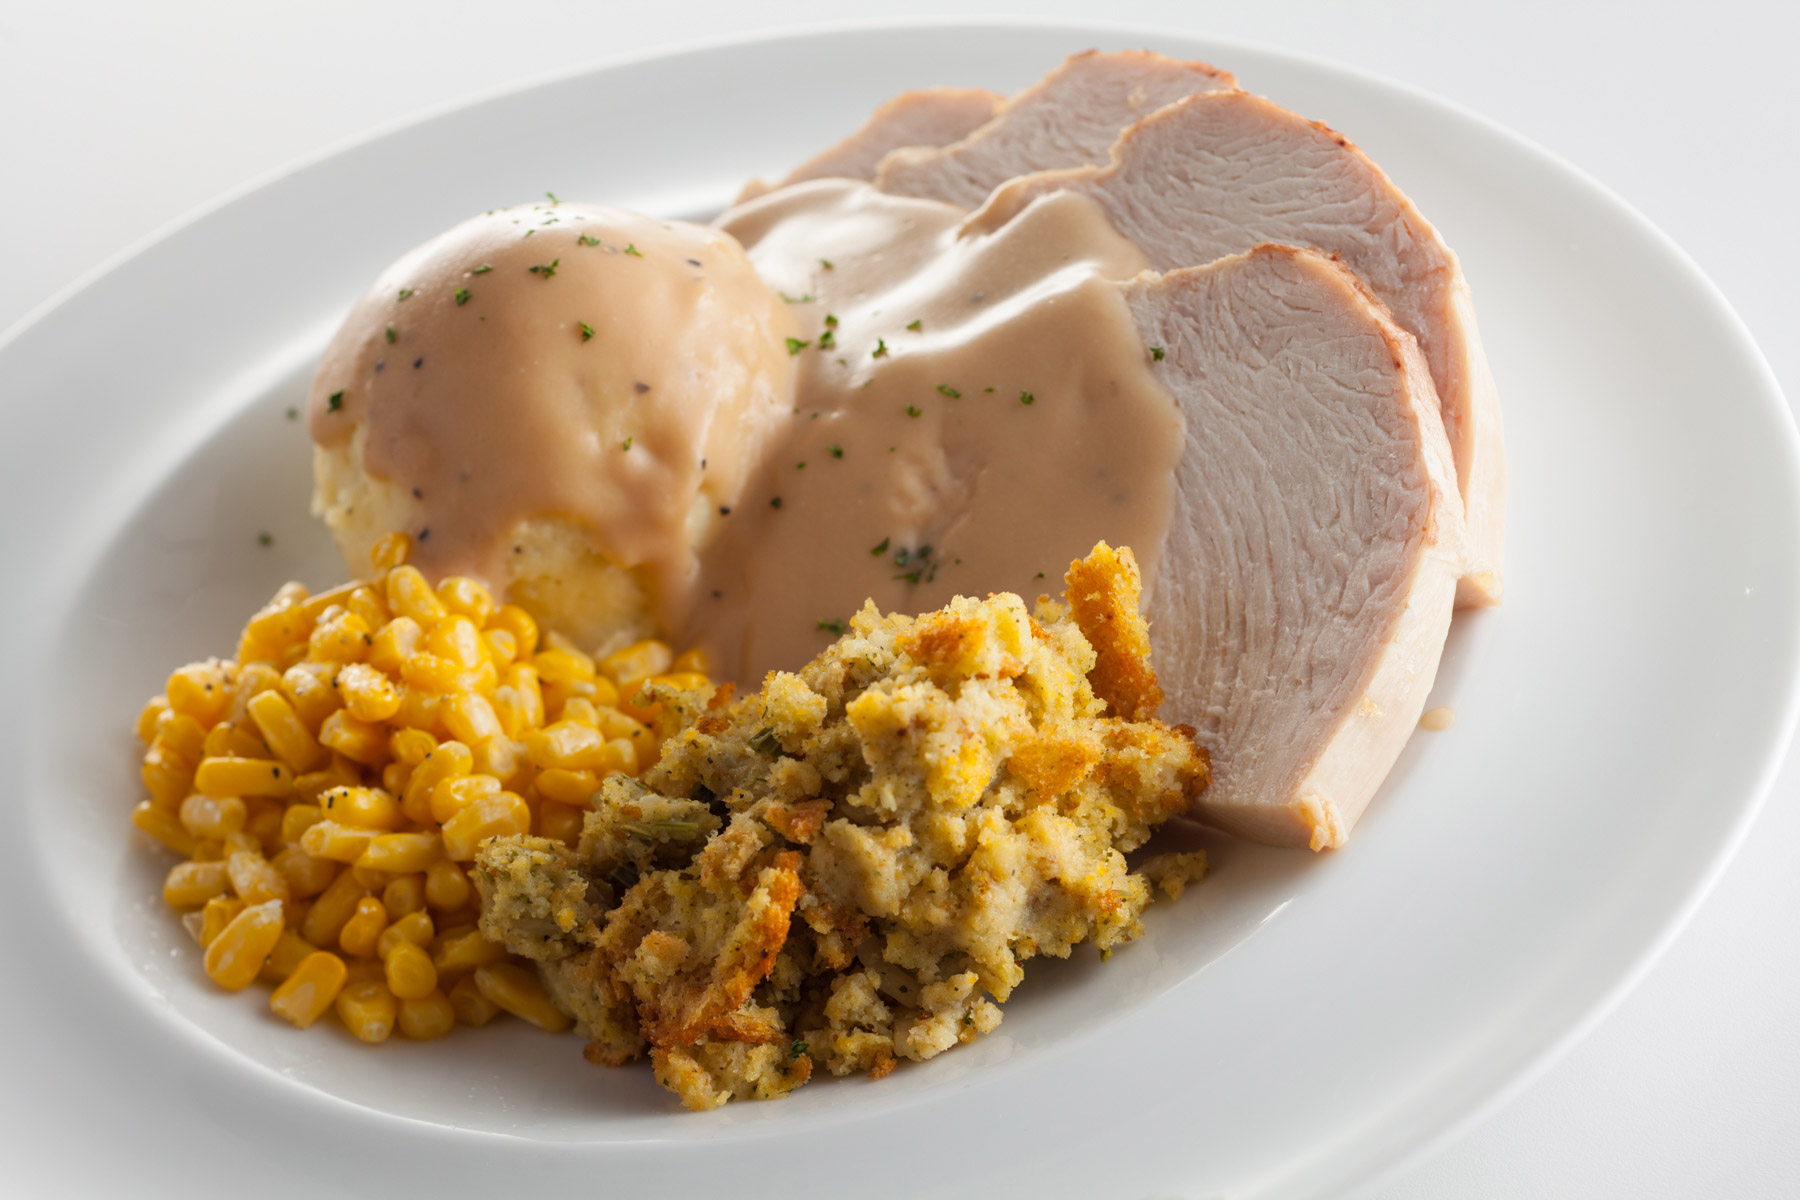 Sliced-Turkey-Breast-Mashed-Potatoes-and-Gravy-sweet-corn-and-stuffing-Gun-Lake-Casino_274.jpg